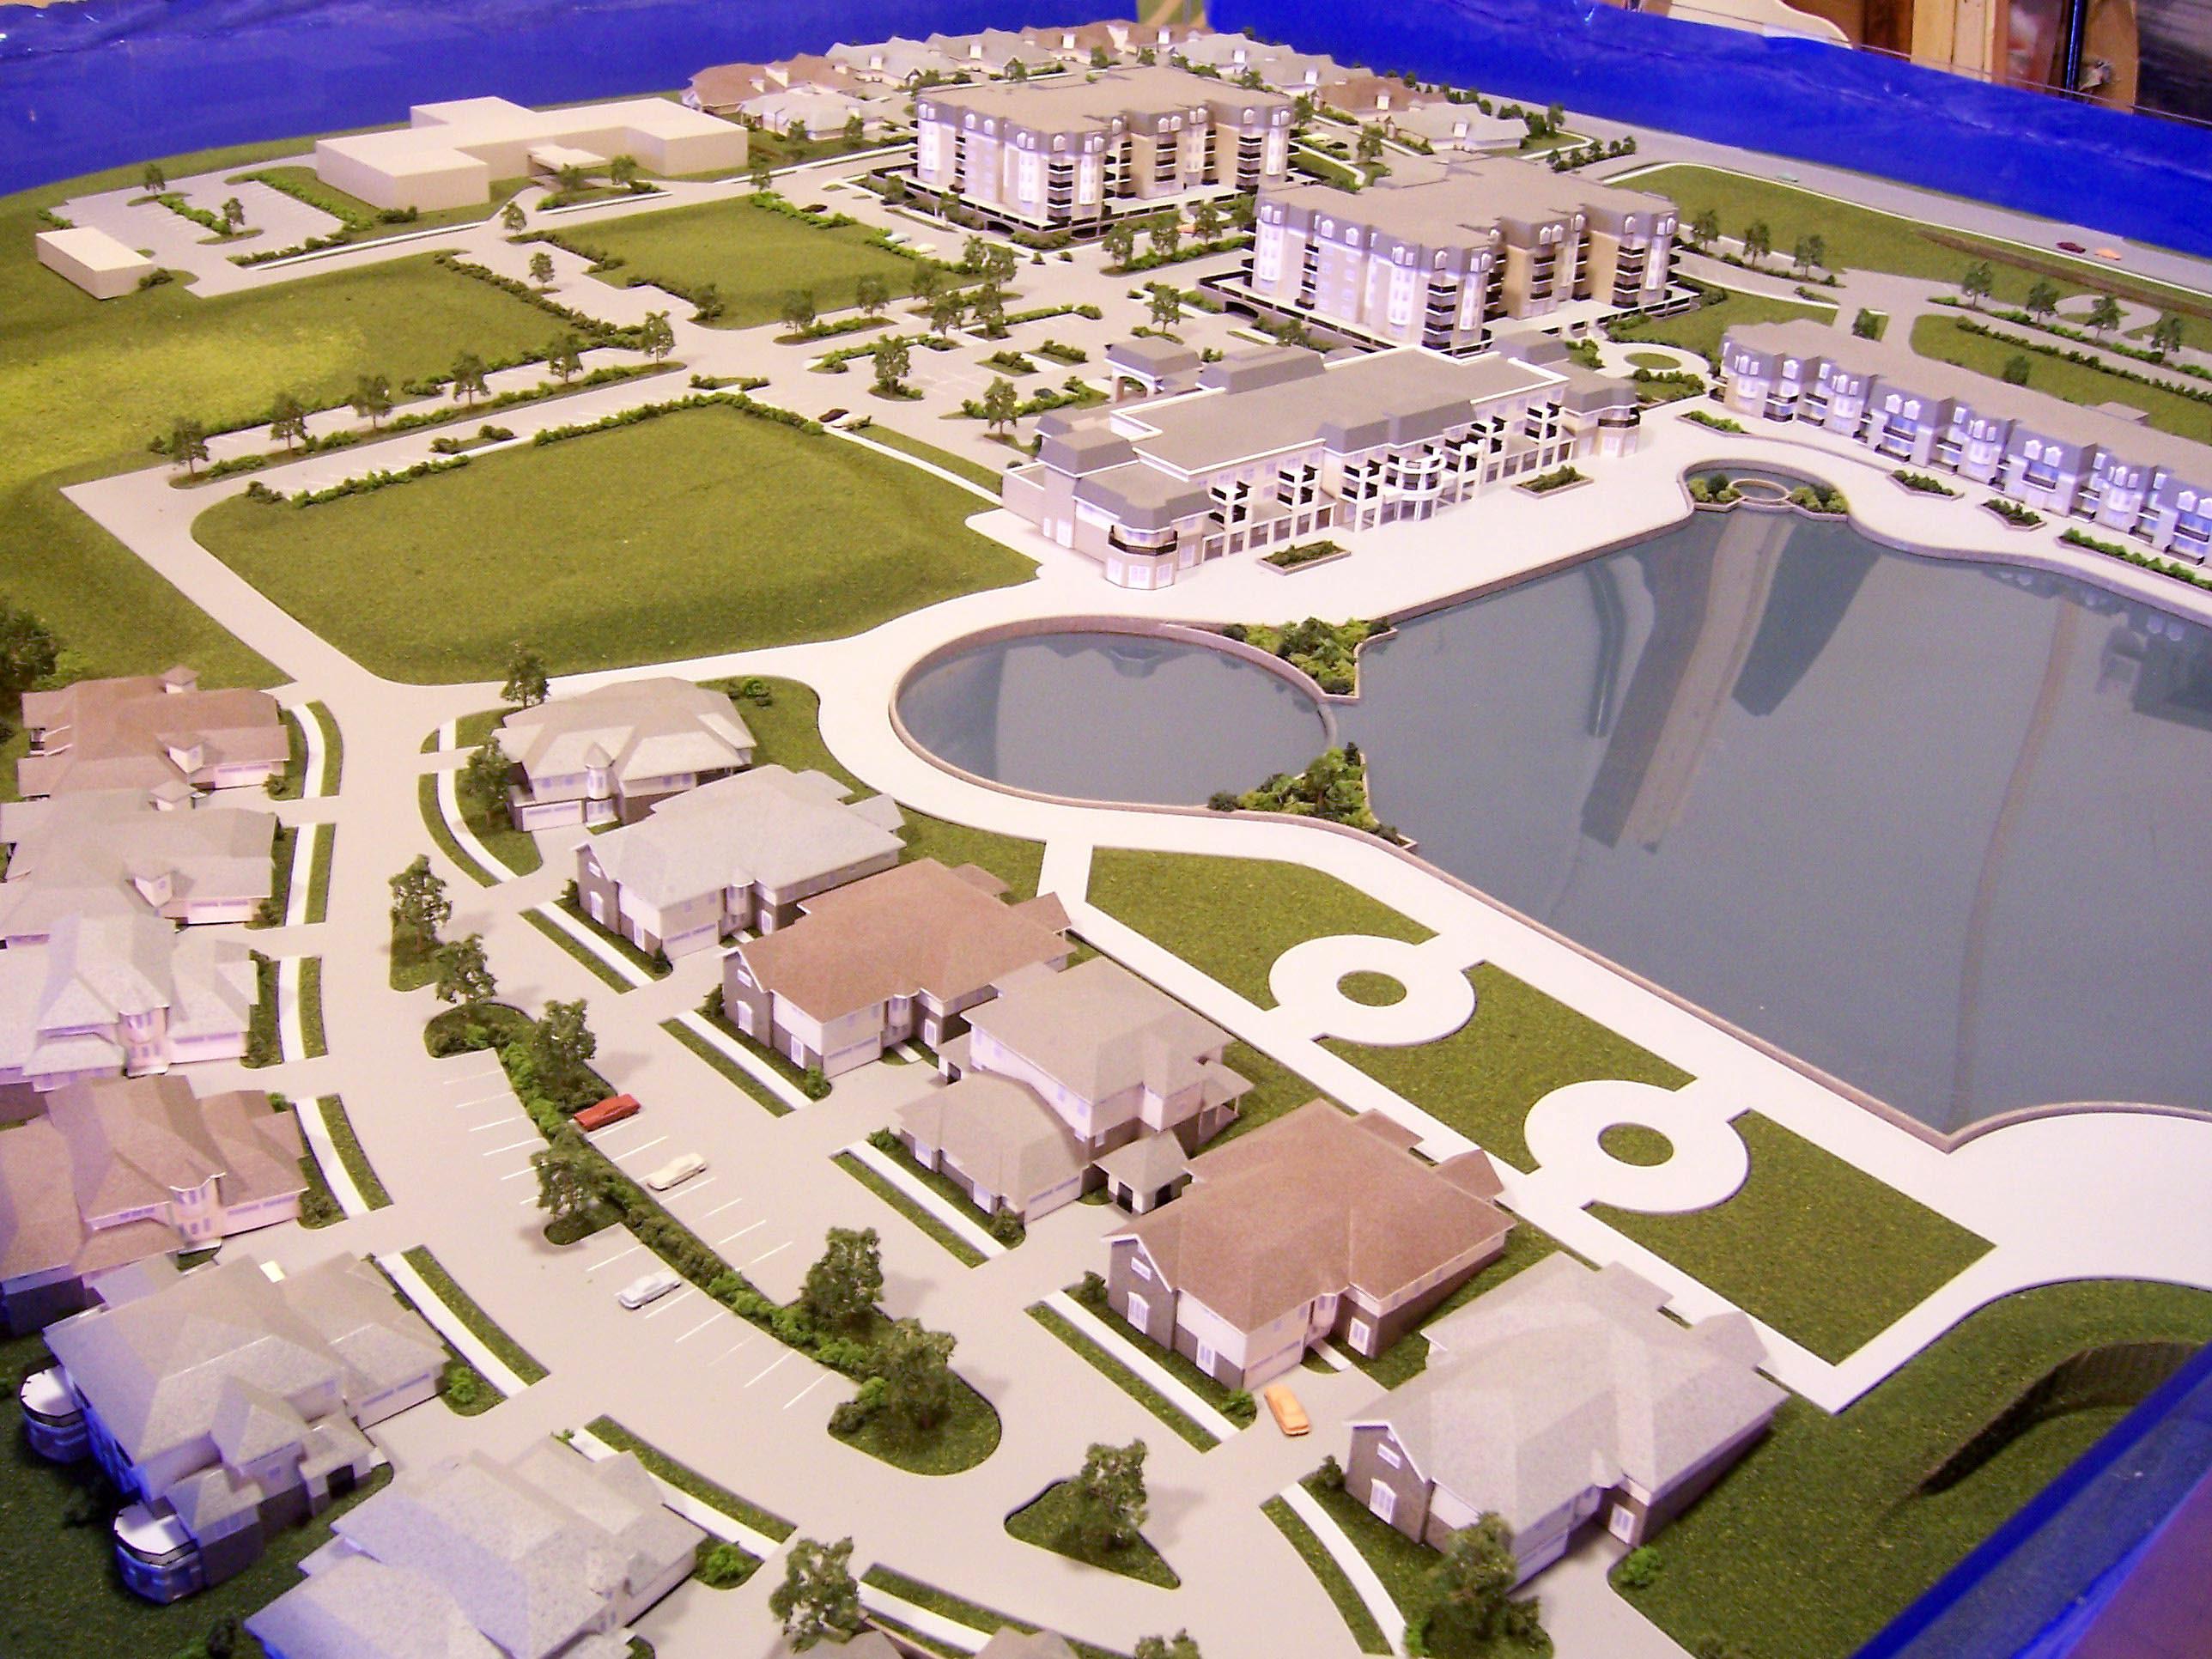 Landscape architecture model archives kiwimill model for Architecture sites